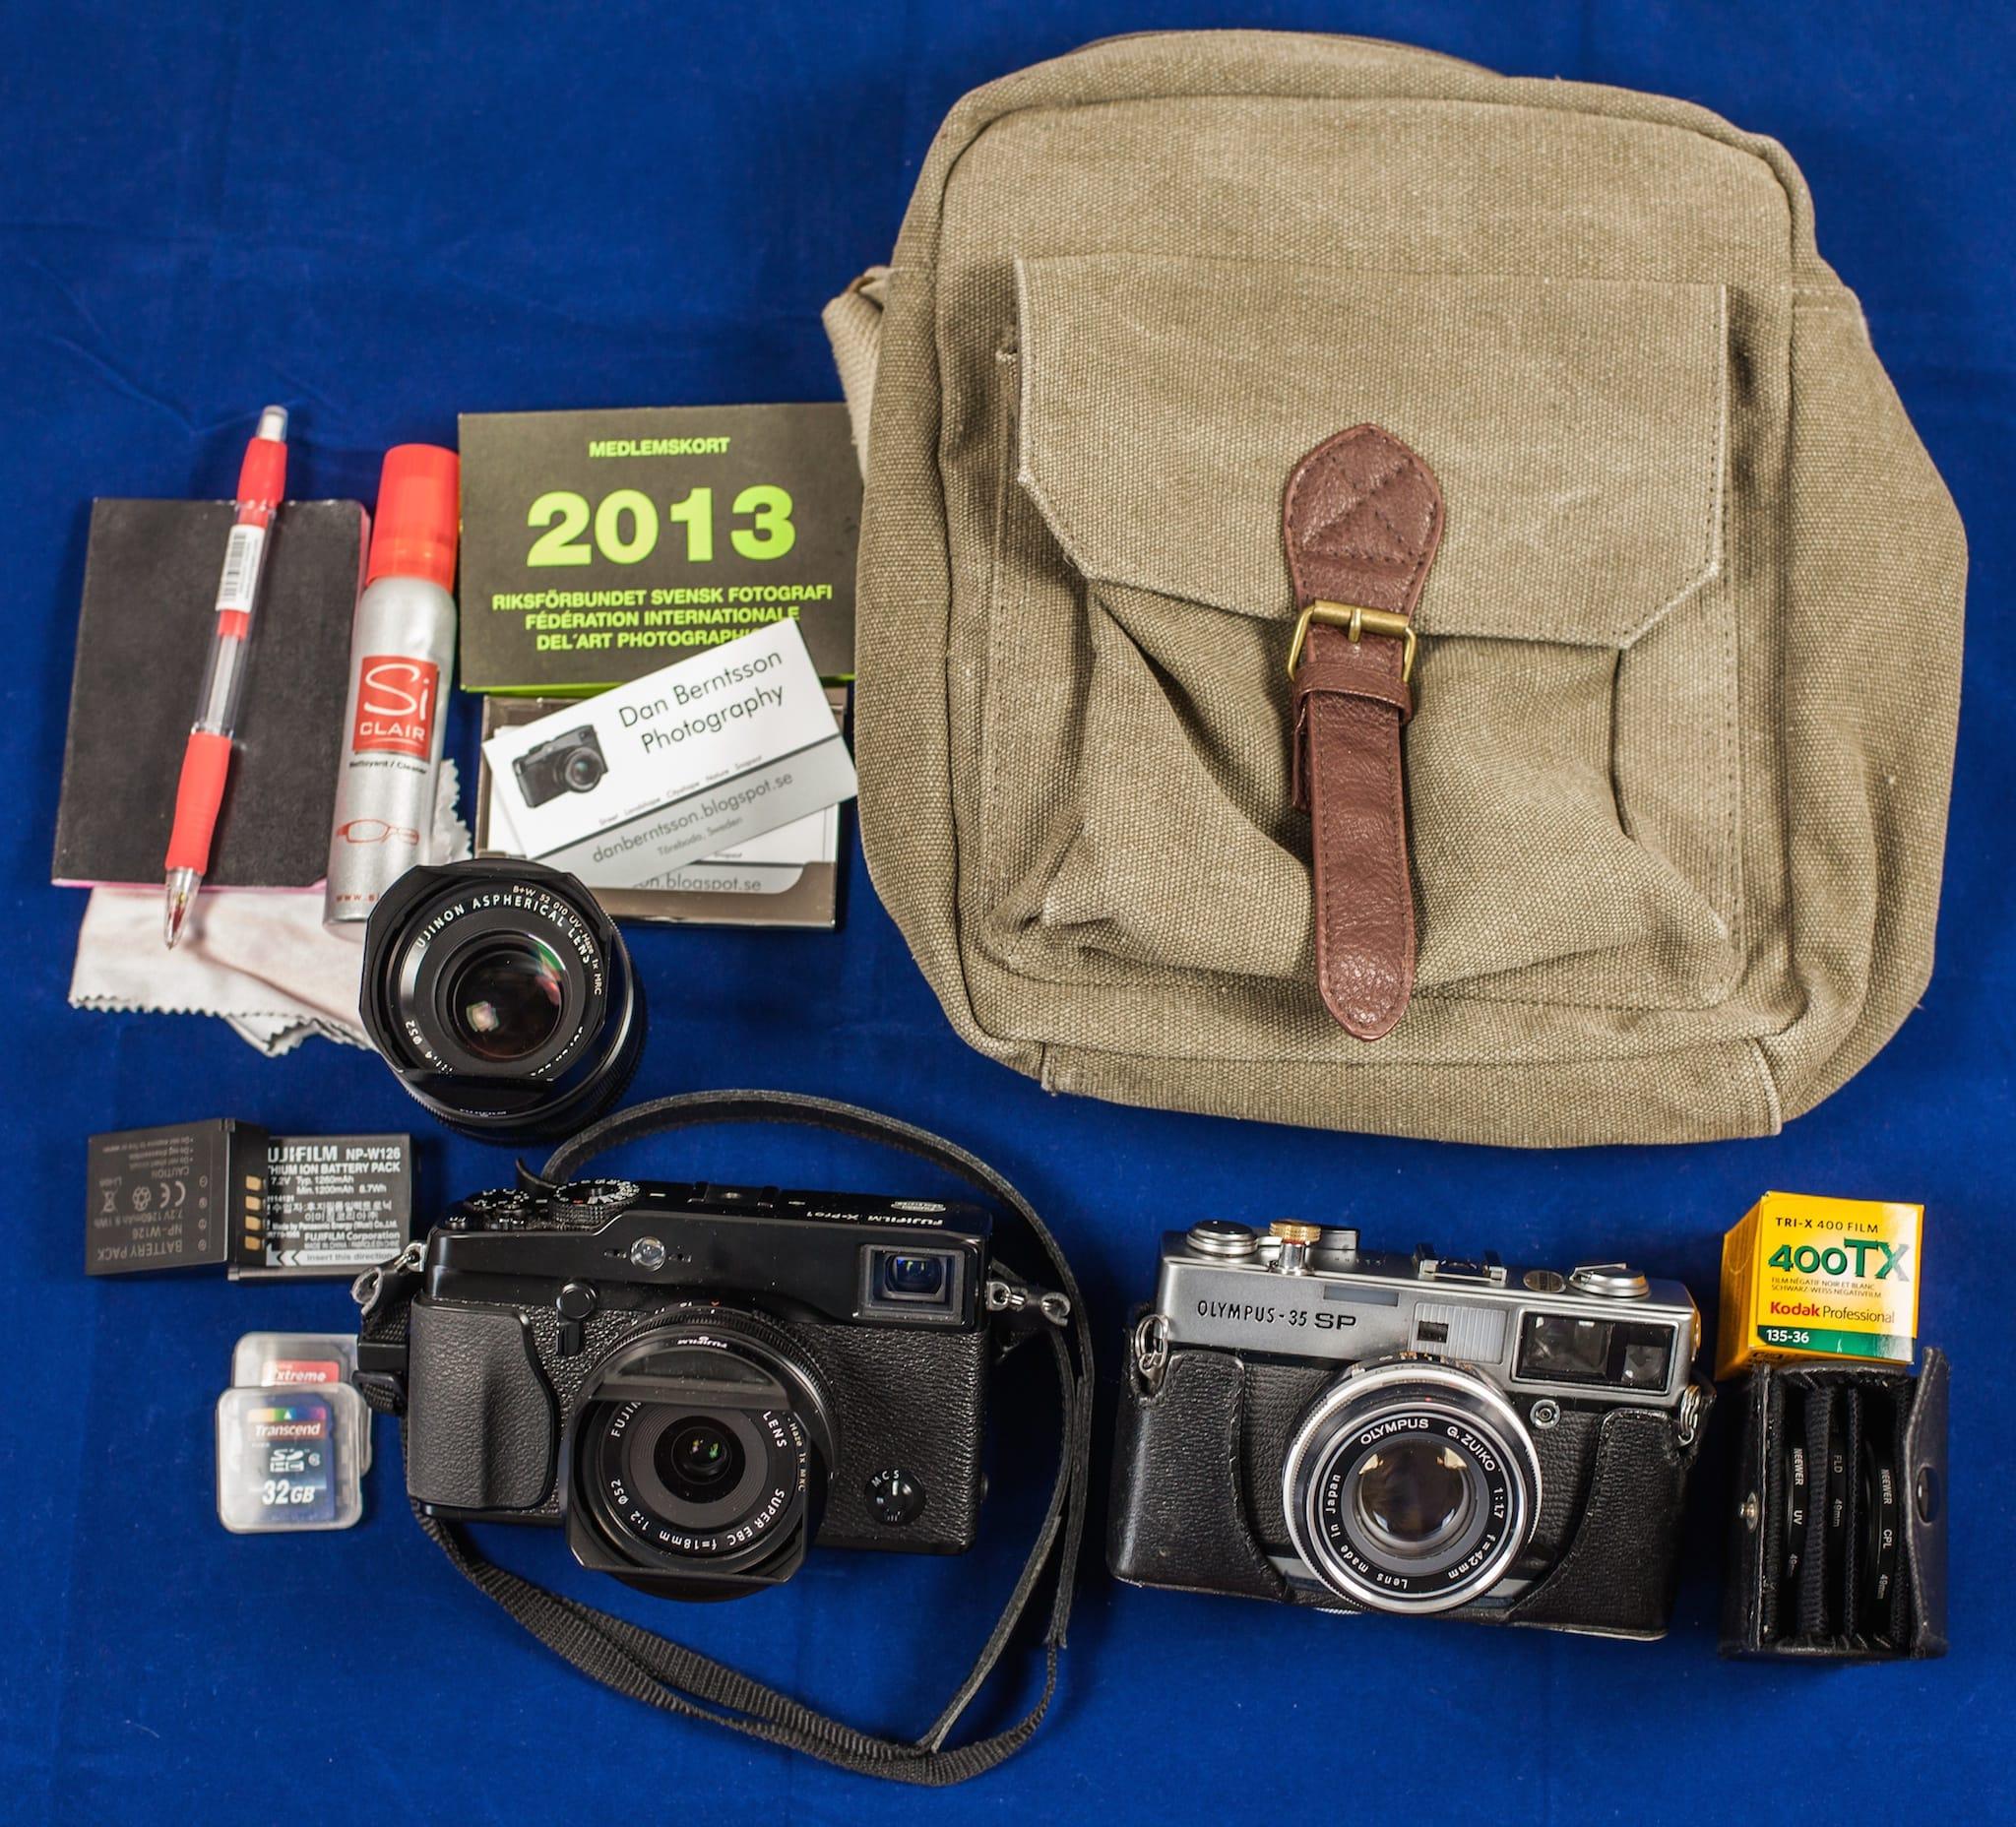 Dan Berntsson's Camera Bag